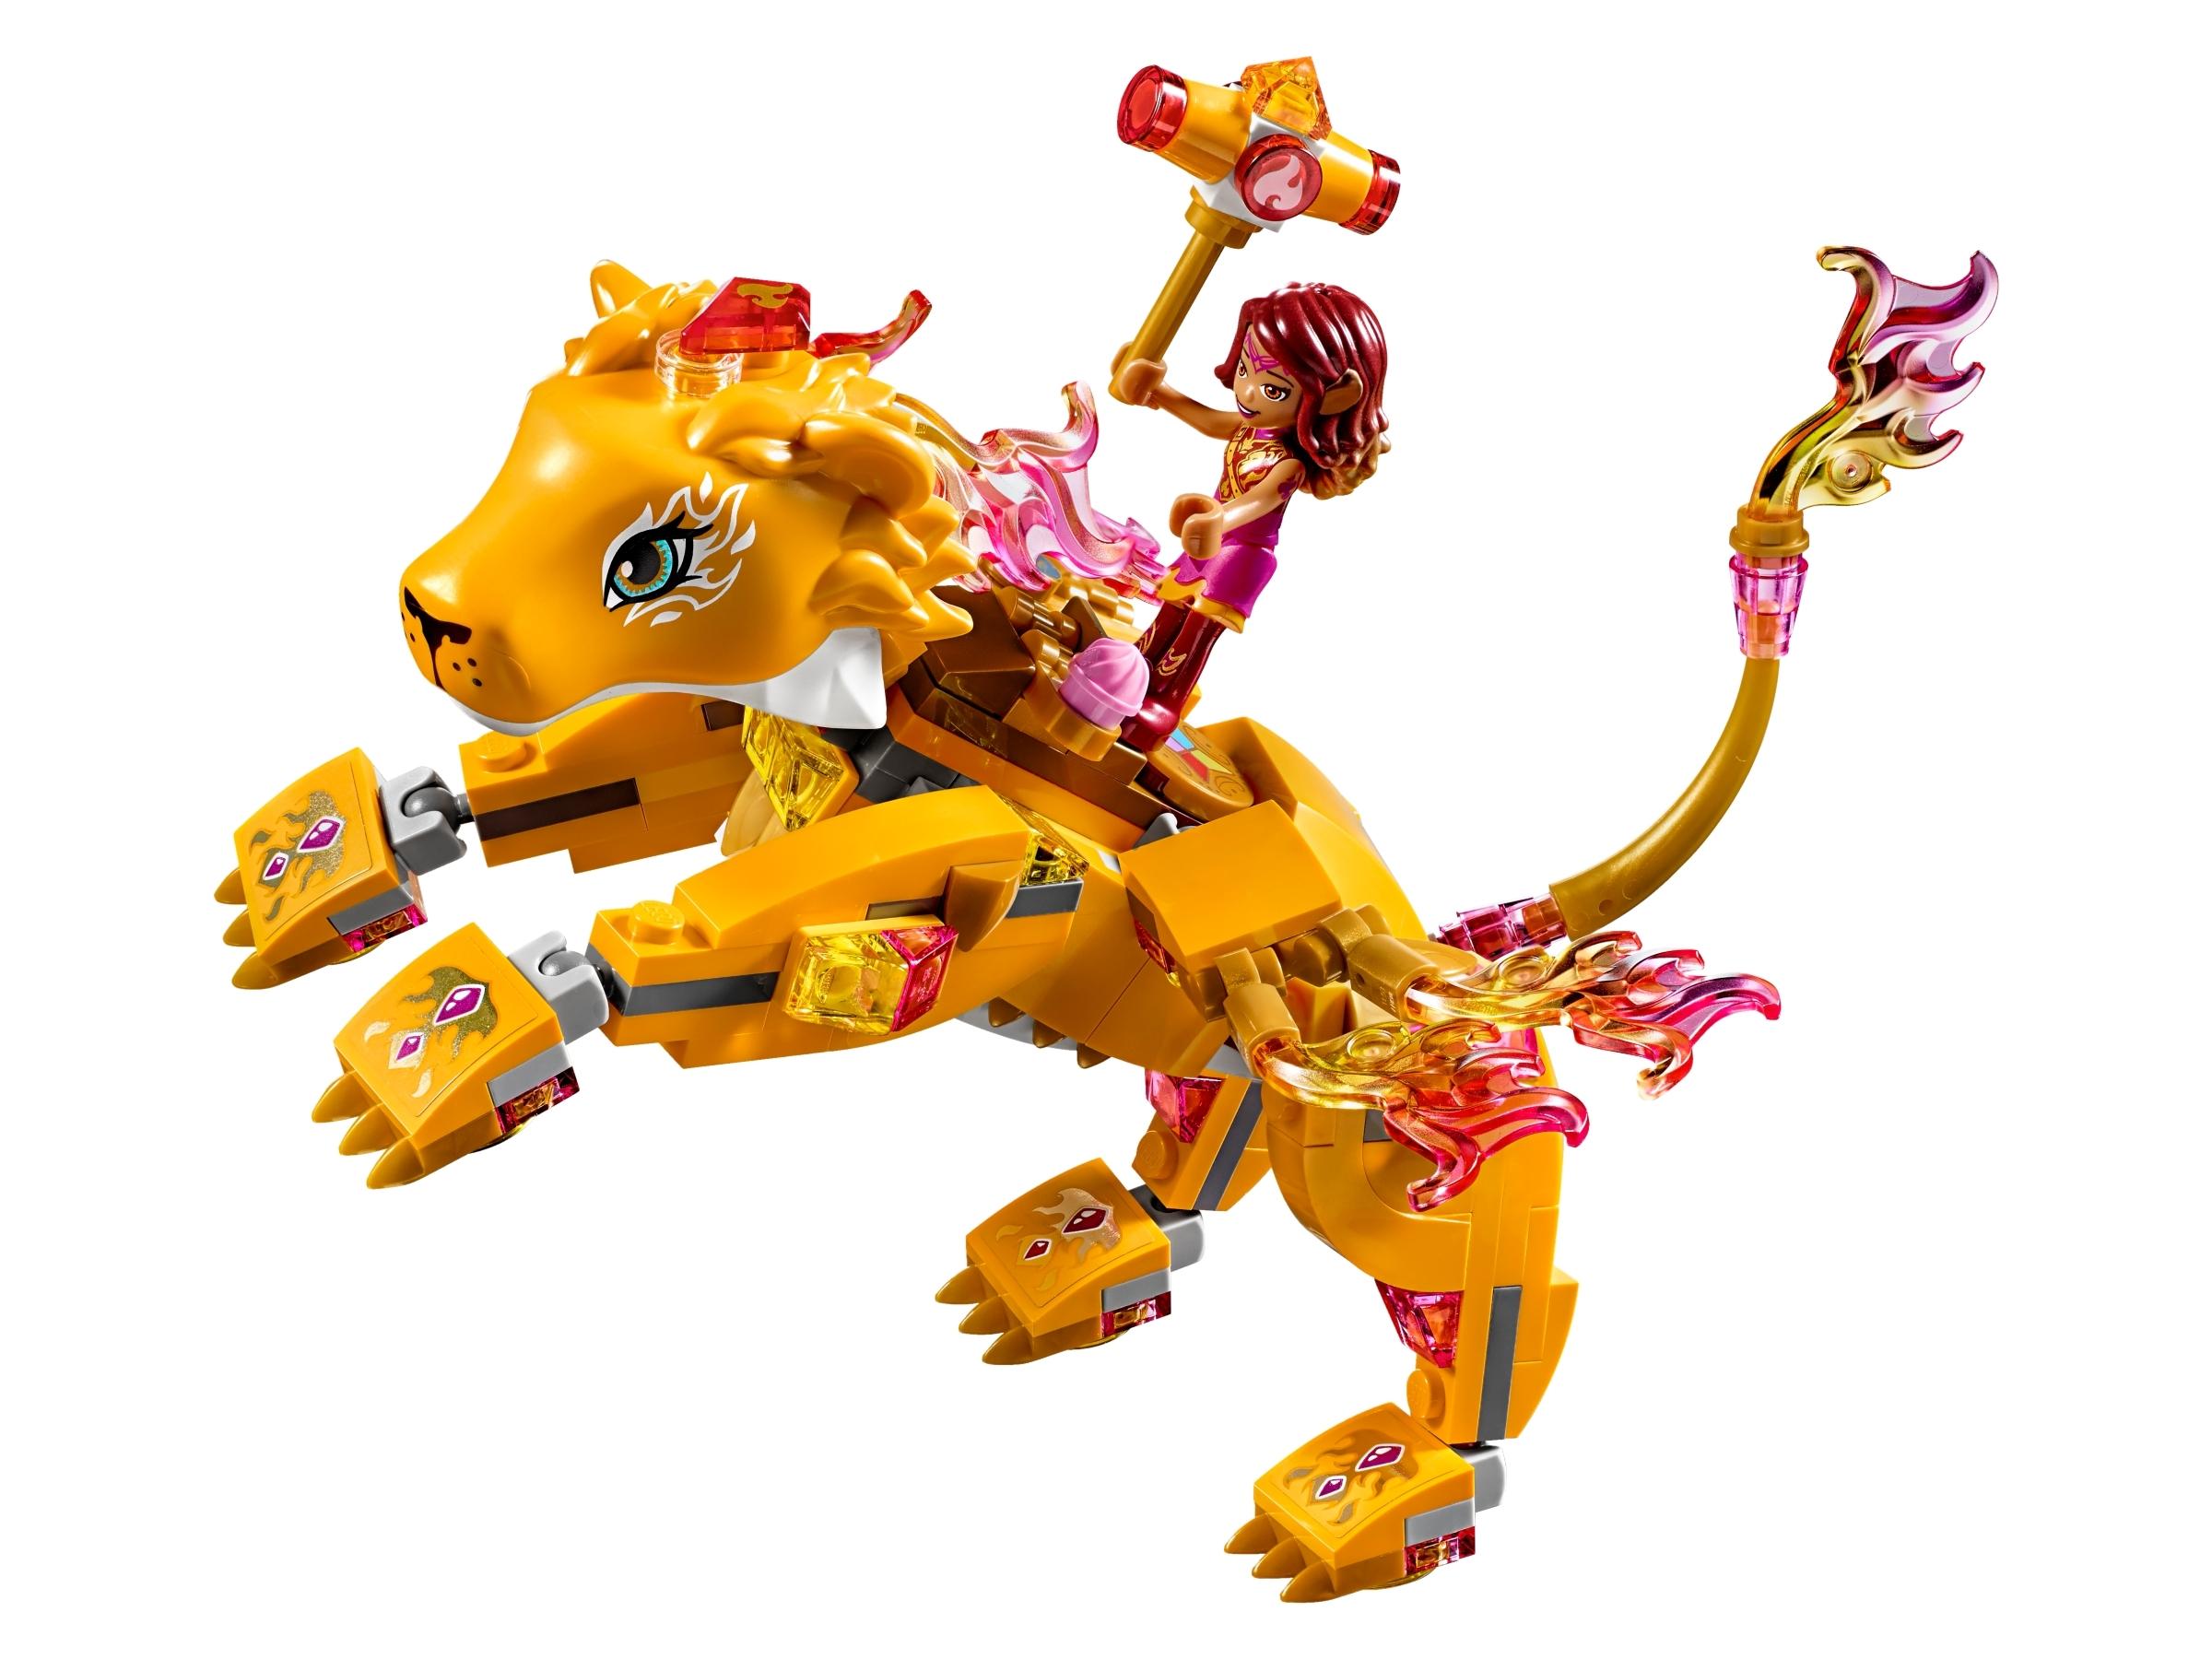 LEGO 41192 Azari /& The Guardian Fire Lion Capture Fantasy Building Toy Playset